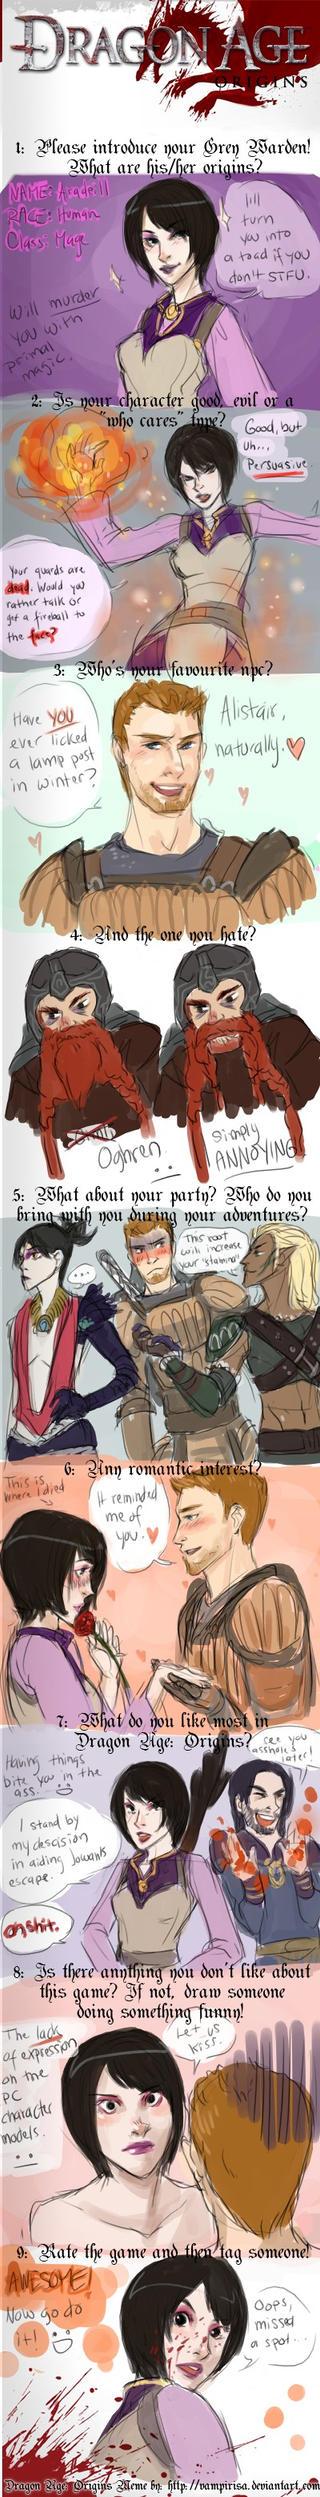 dragon age origins meme by kiikii-sempai